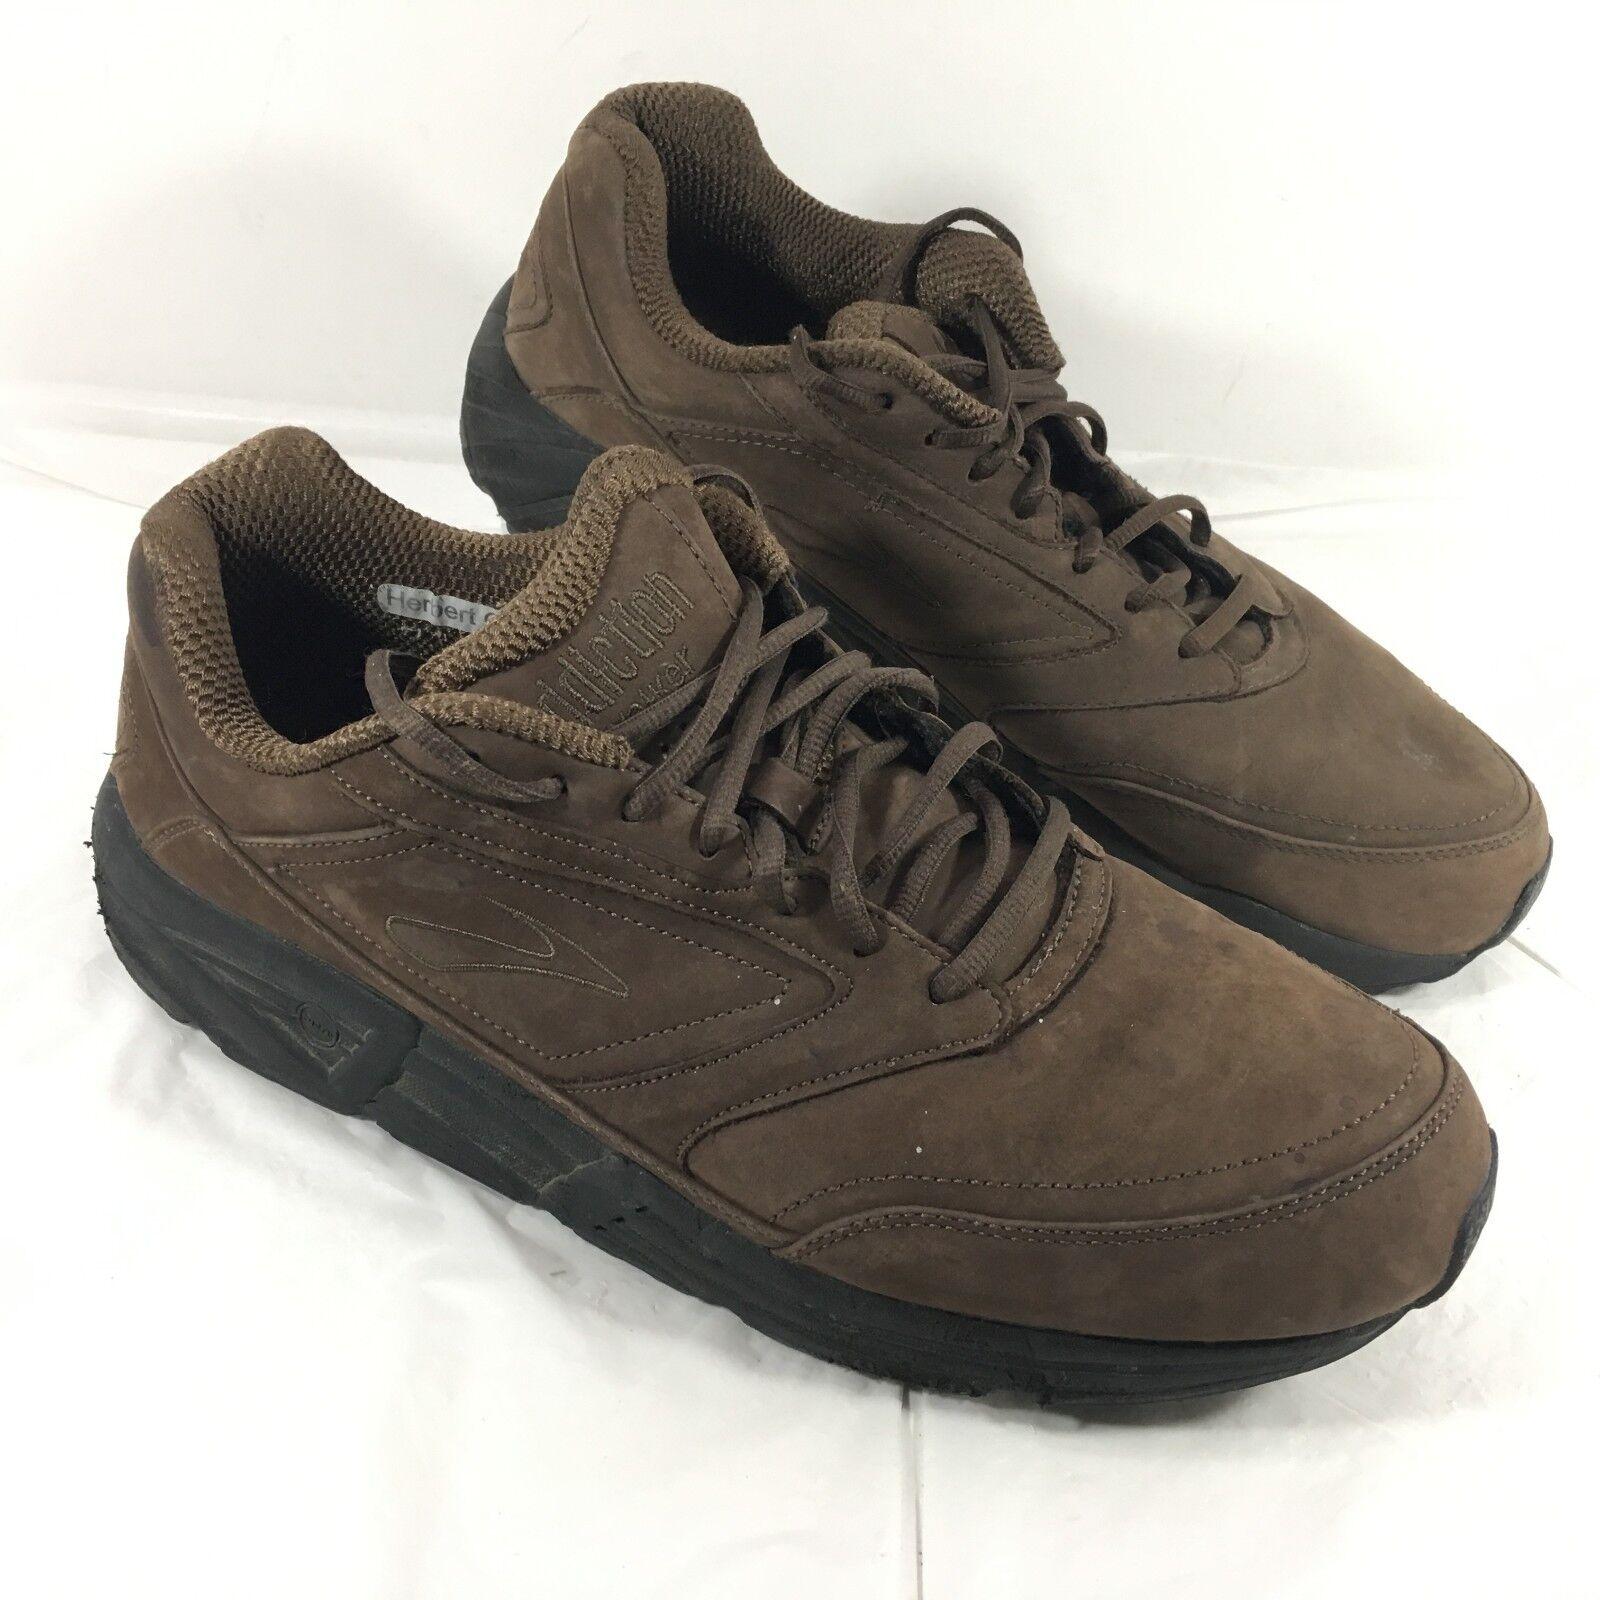 Men's Brooks Addiction Walker Comfort shoes Brown leather Sz 14 M